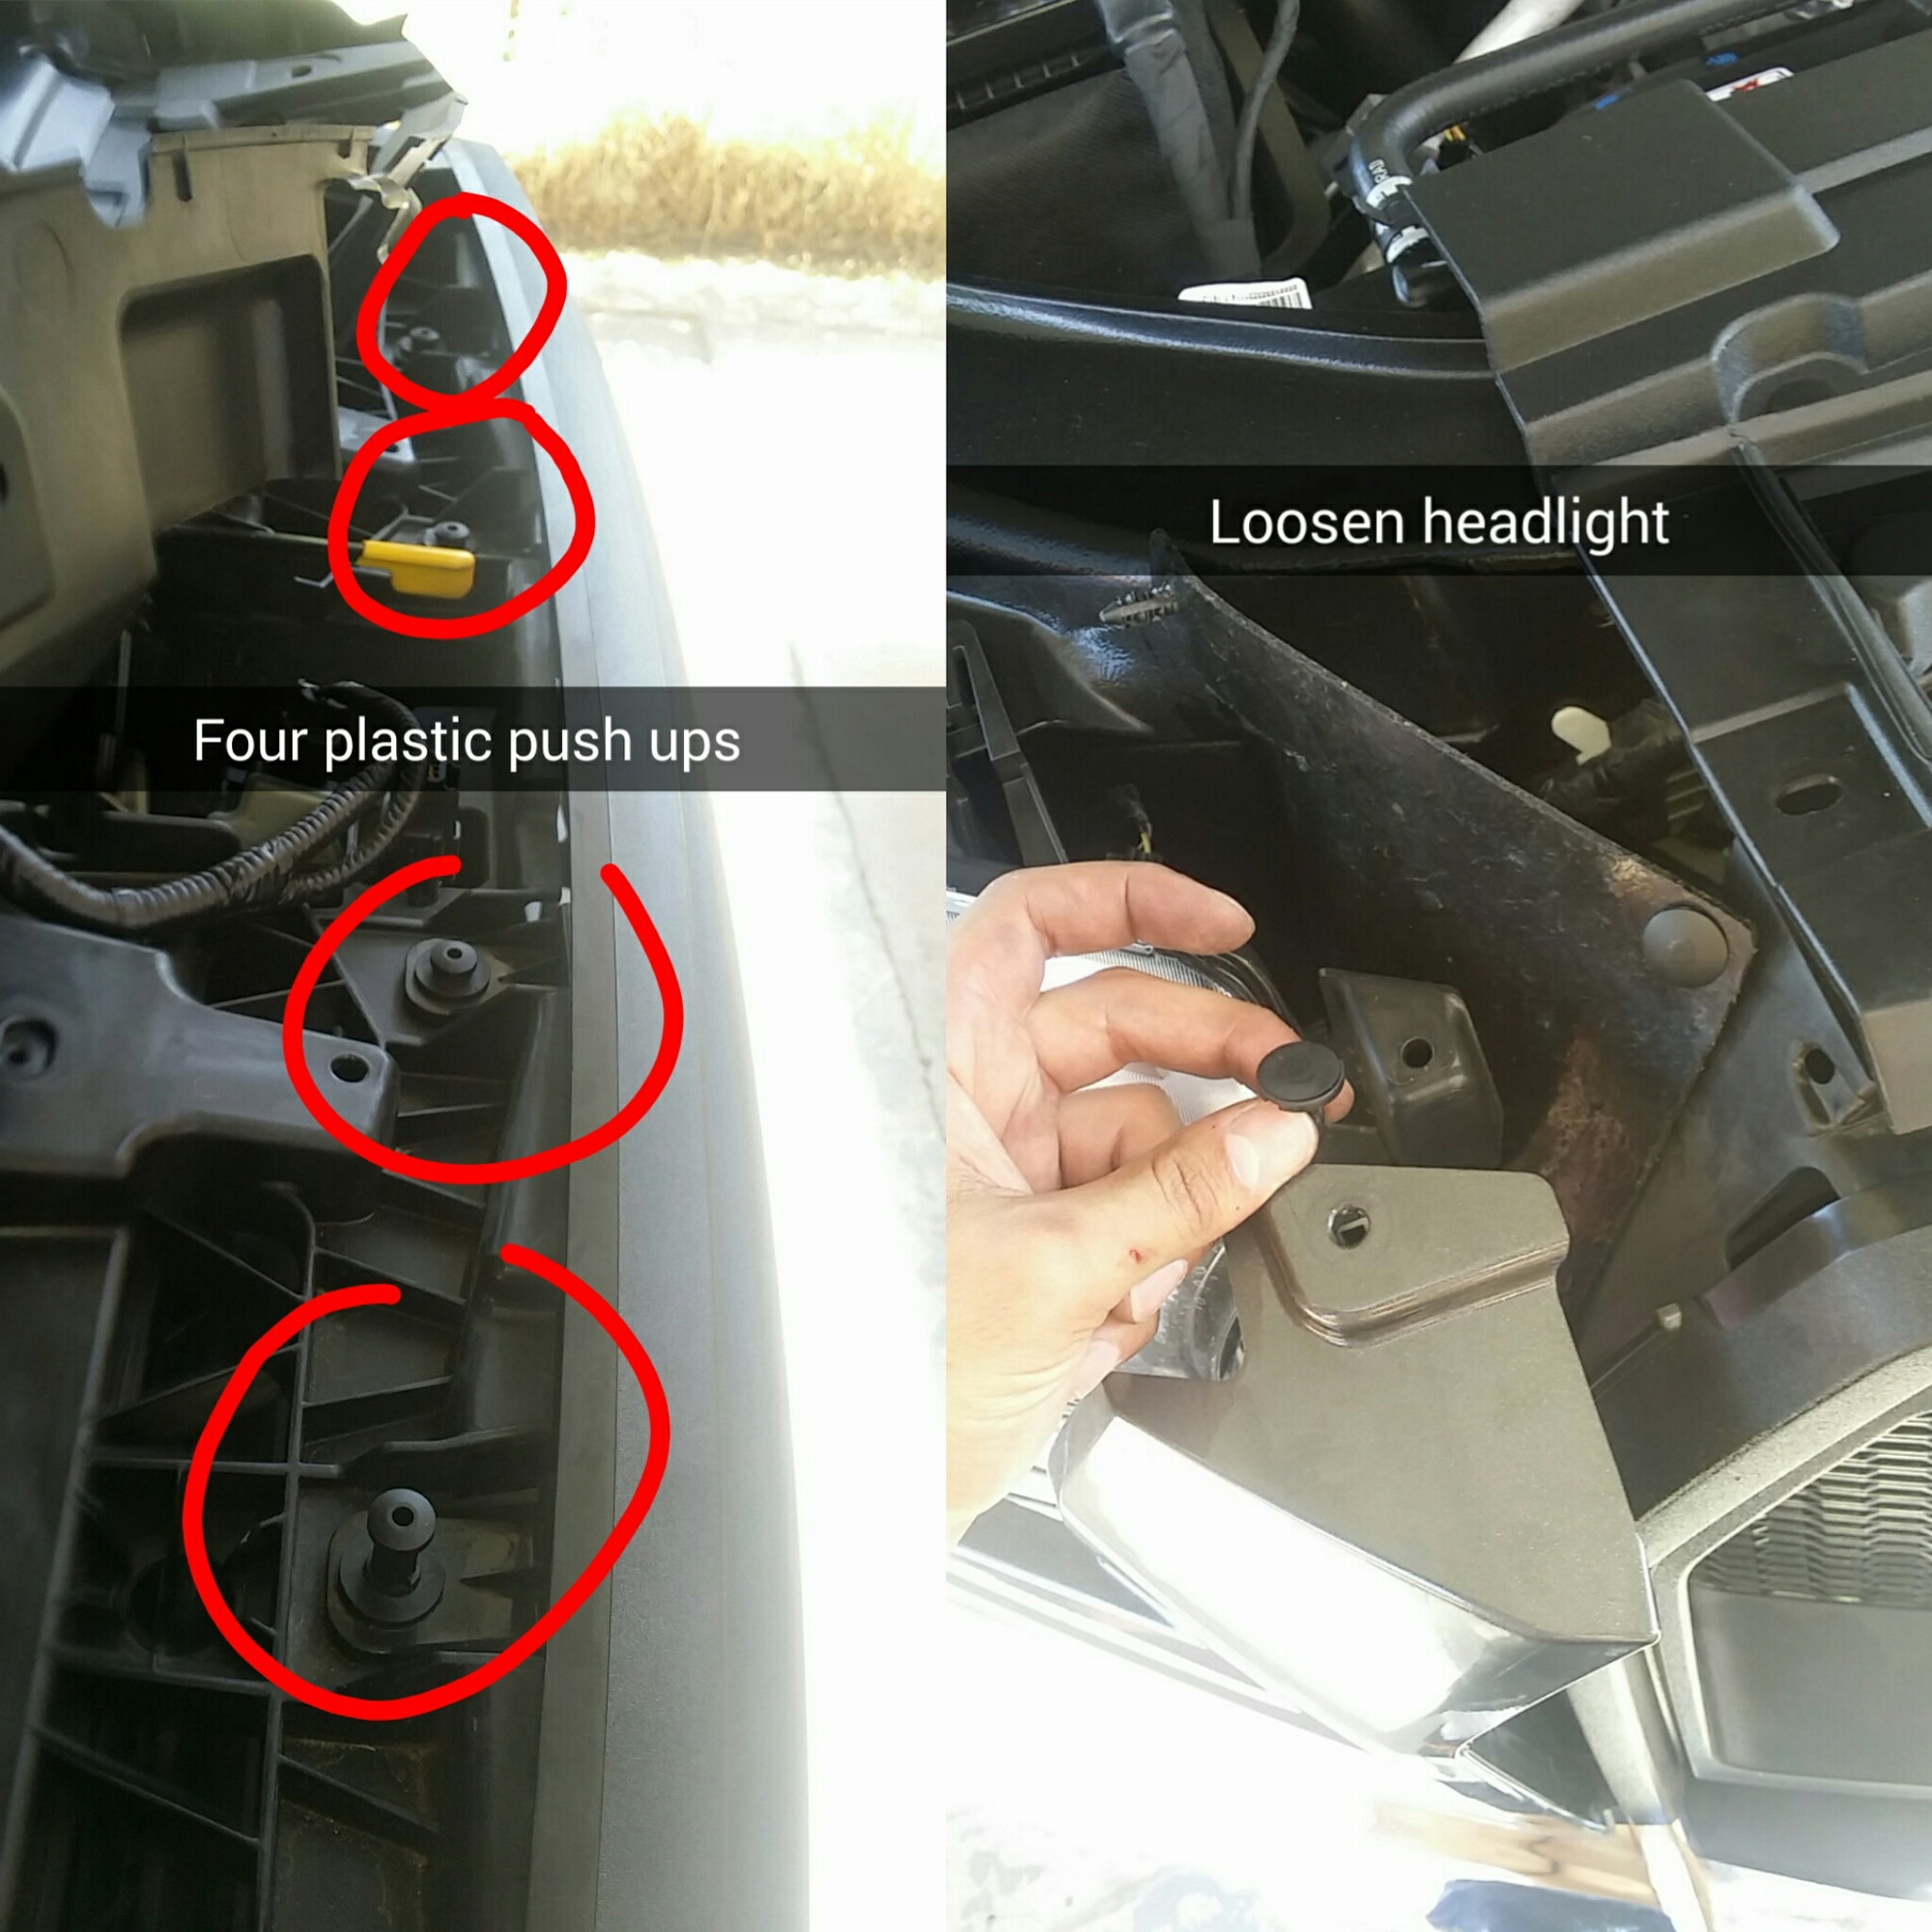 removing grill (pics pics pics) - Ford F150 Forum